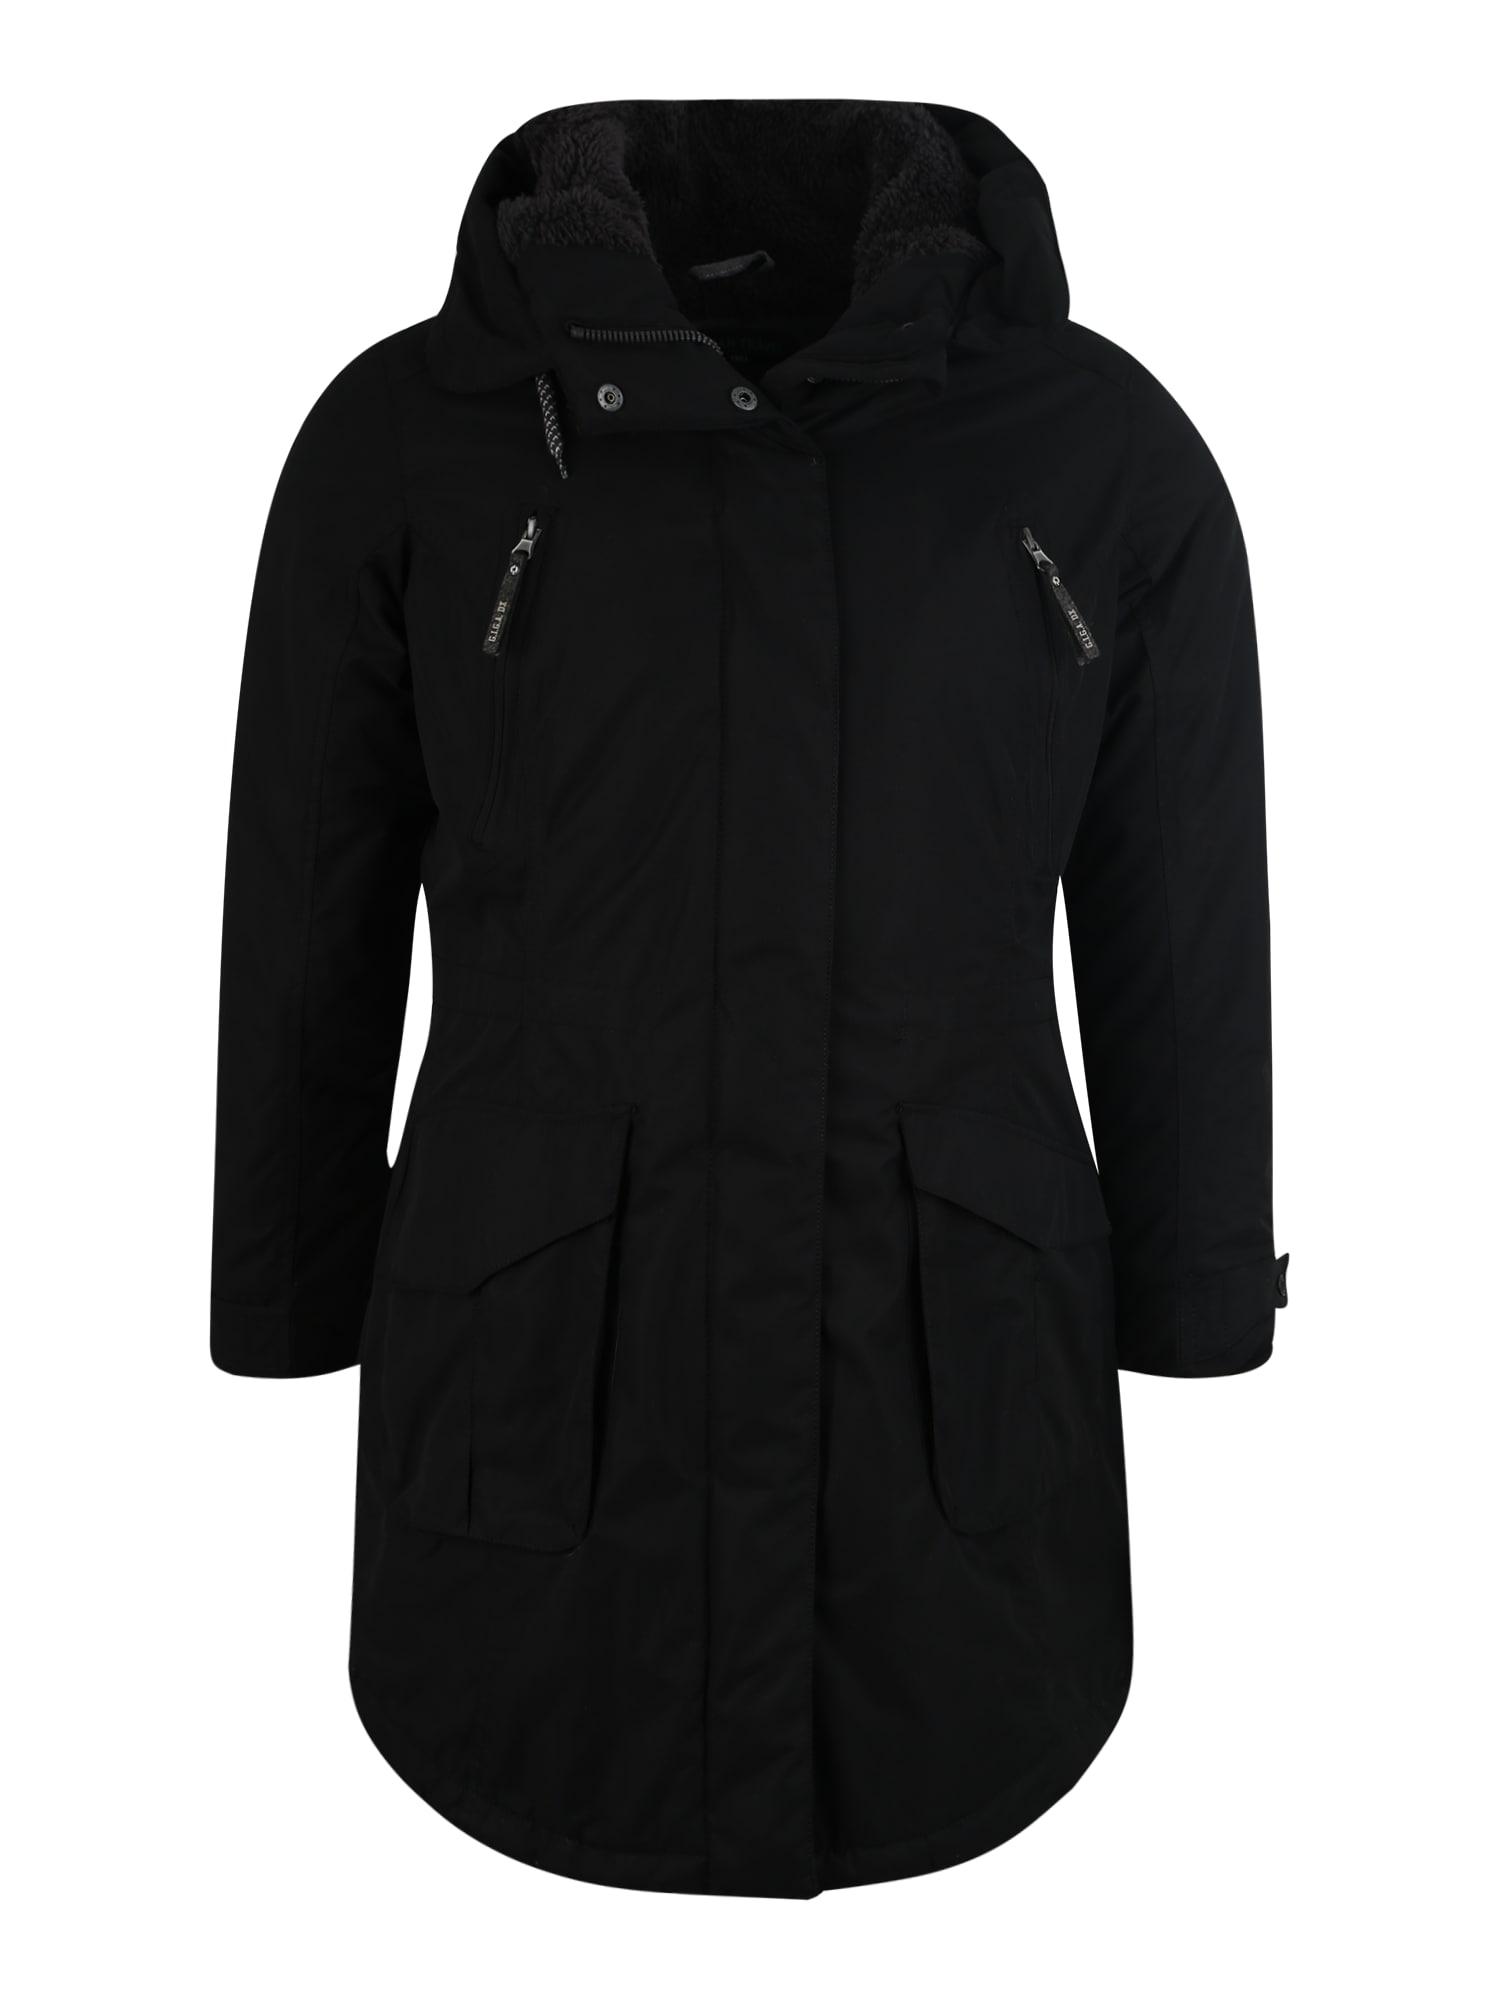 Outdoorový kabát Mawota černá G.I.G.A. DX